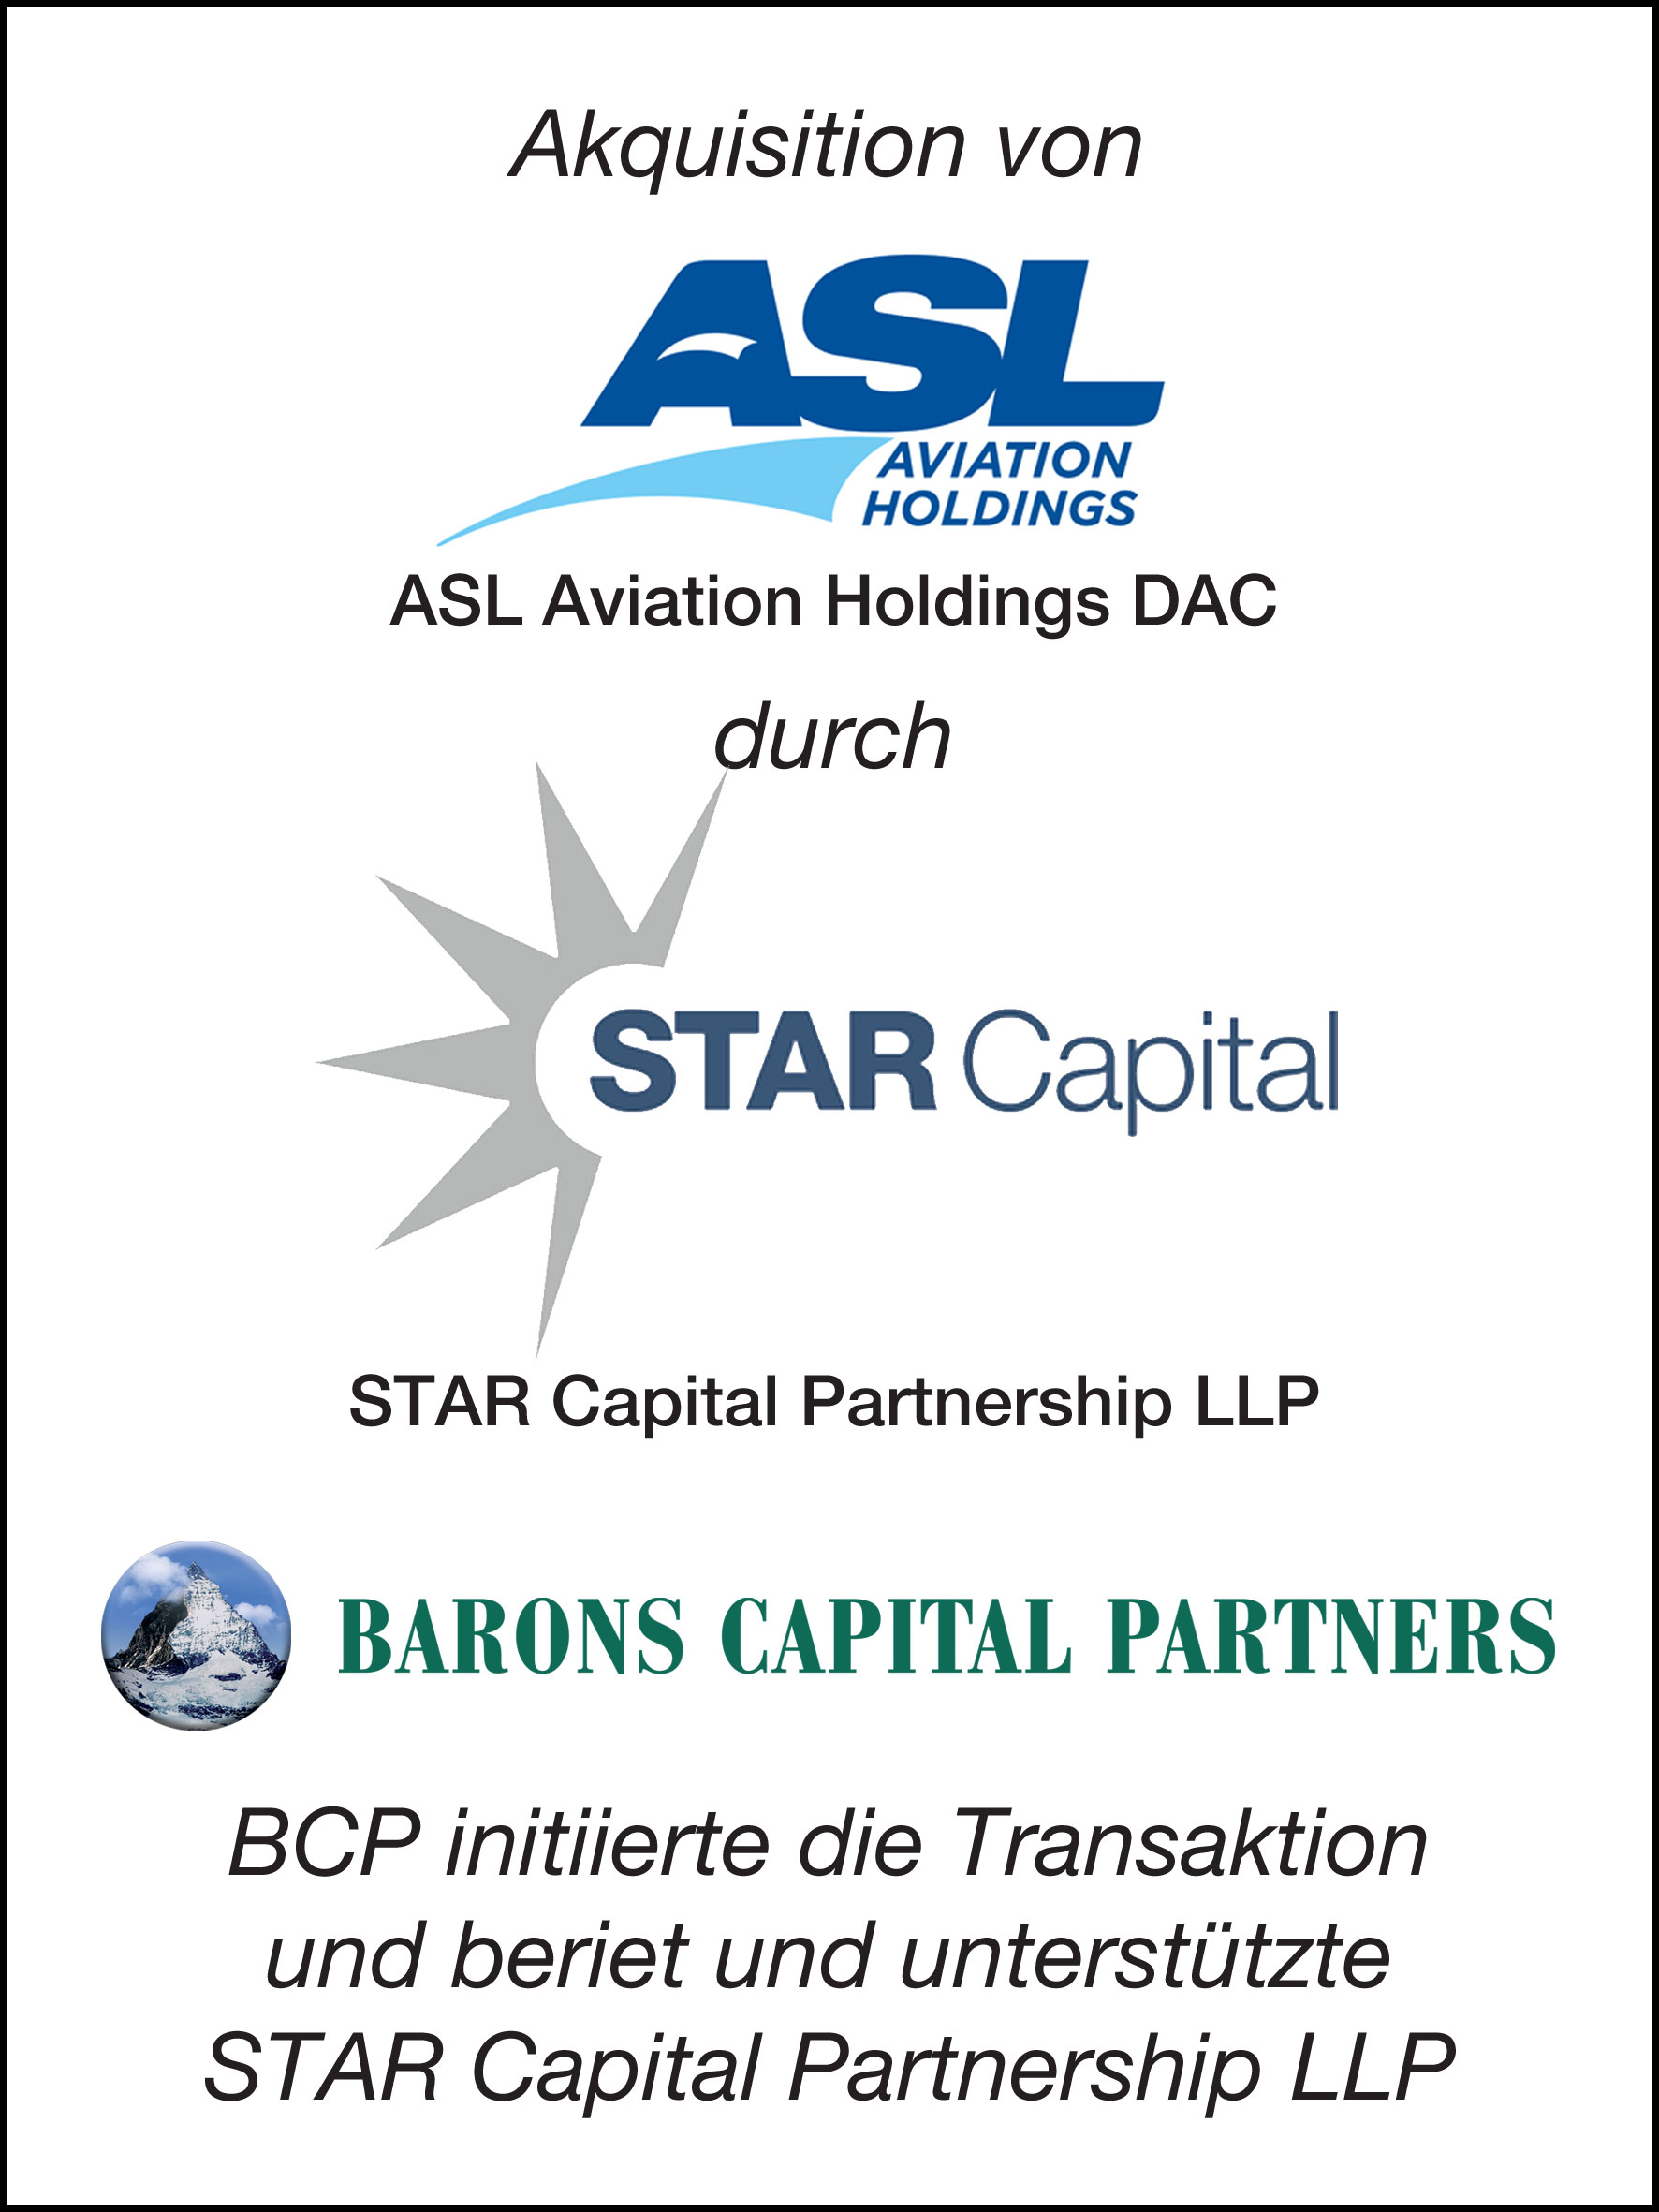 4_ASL Aviation Holdings DAC_G